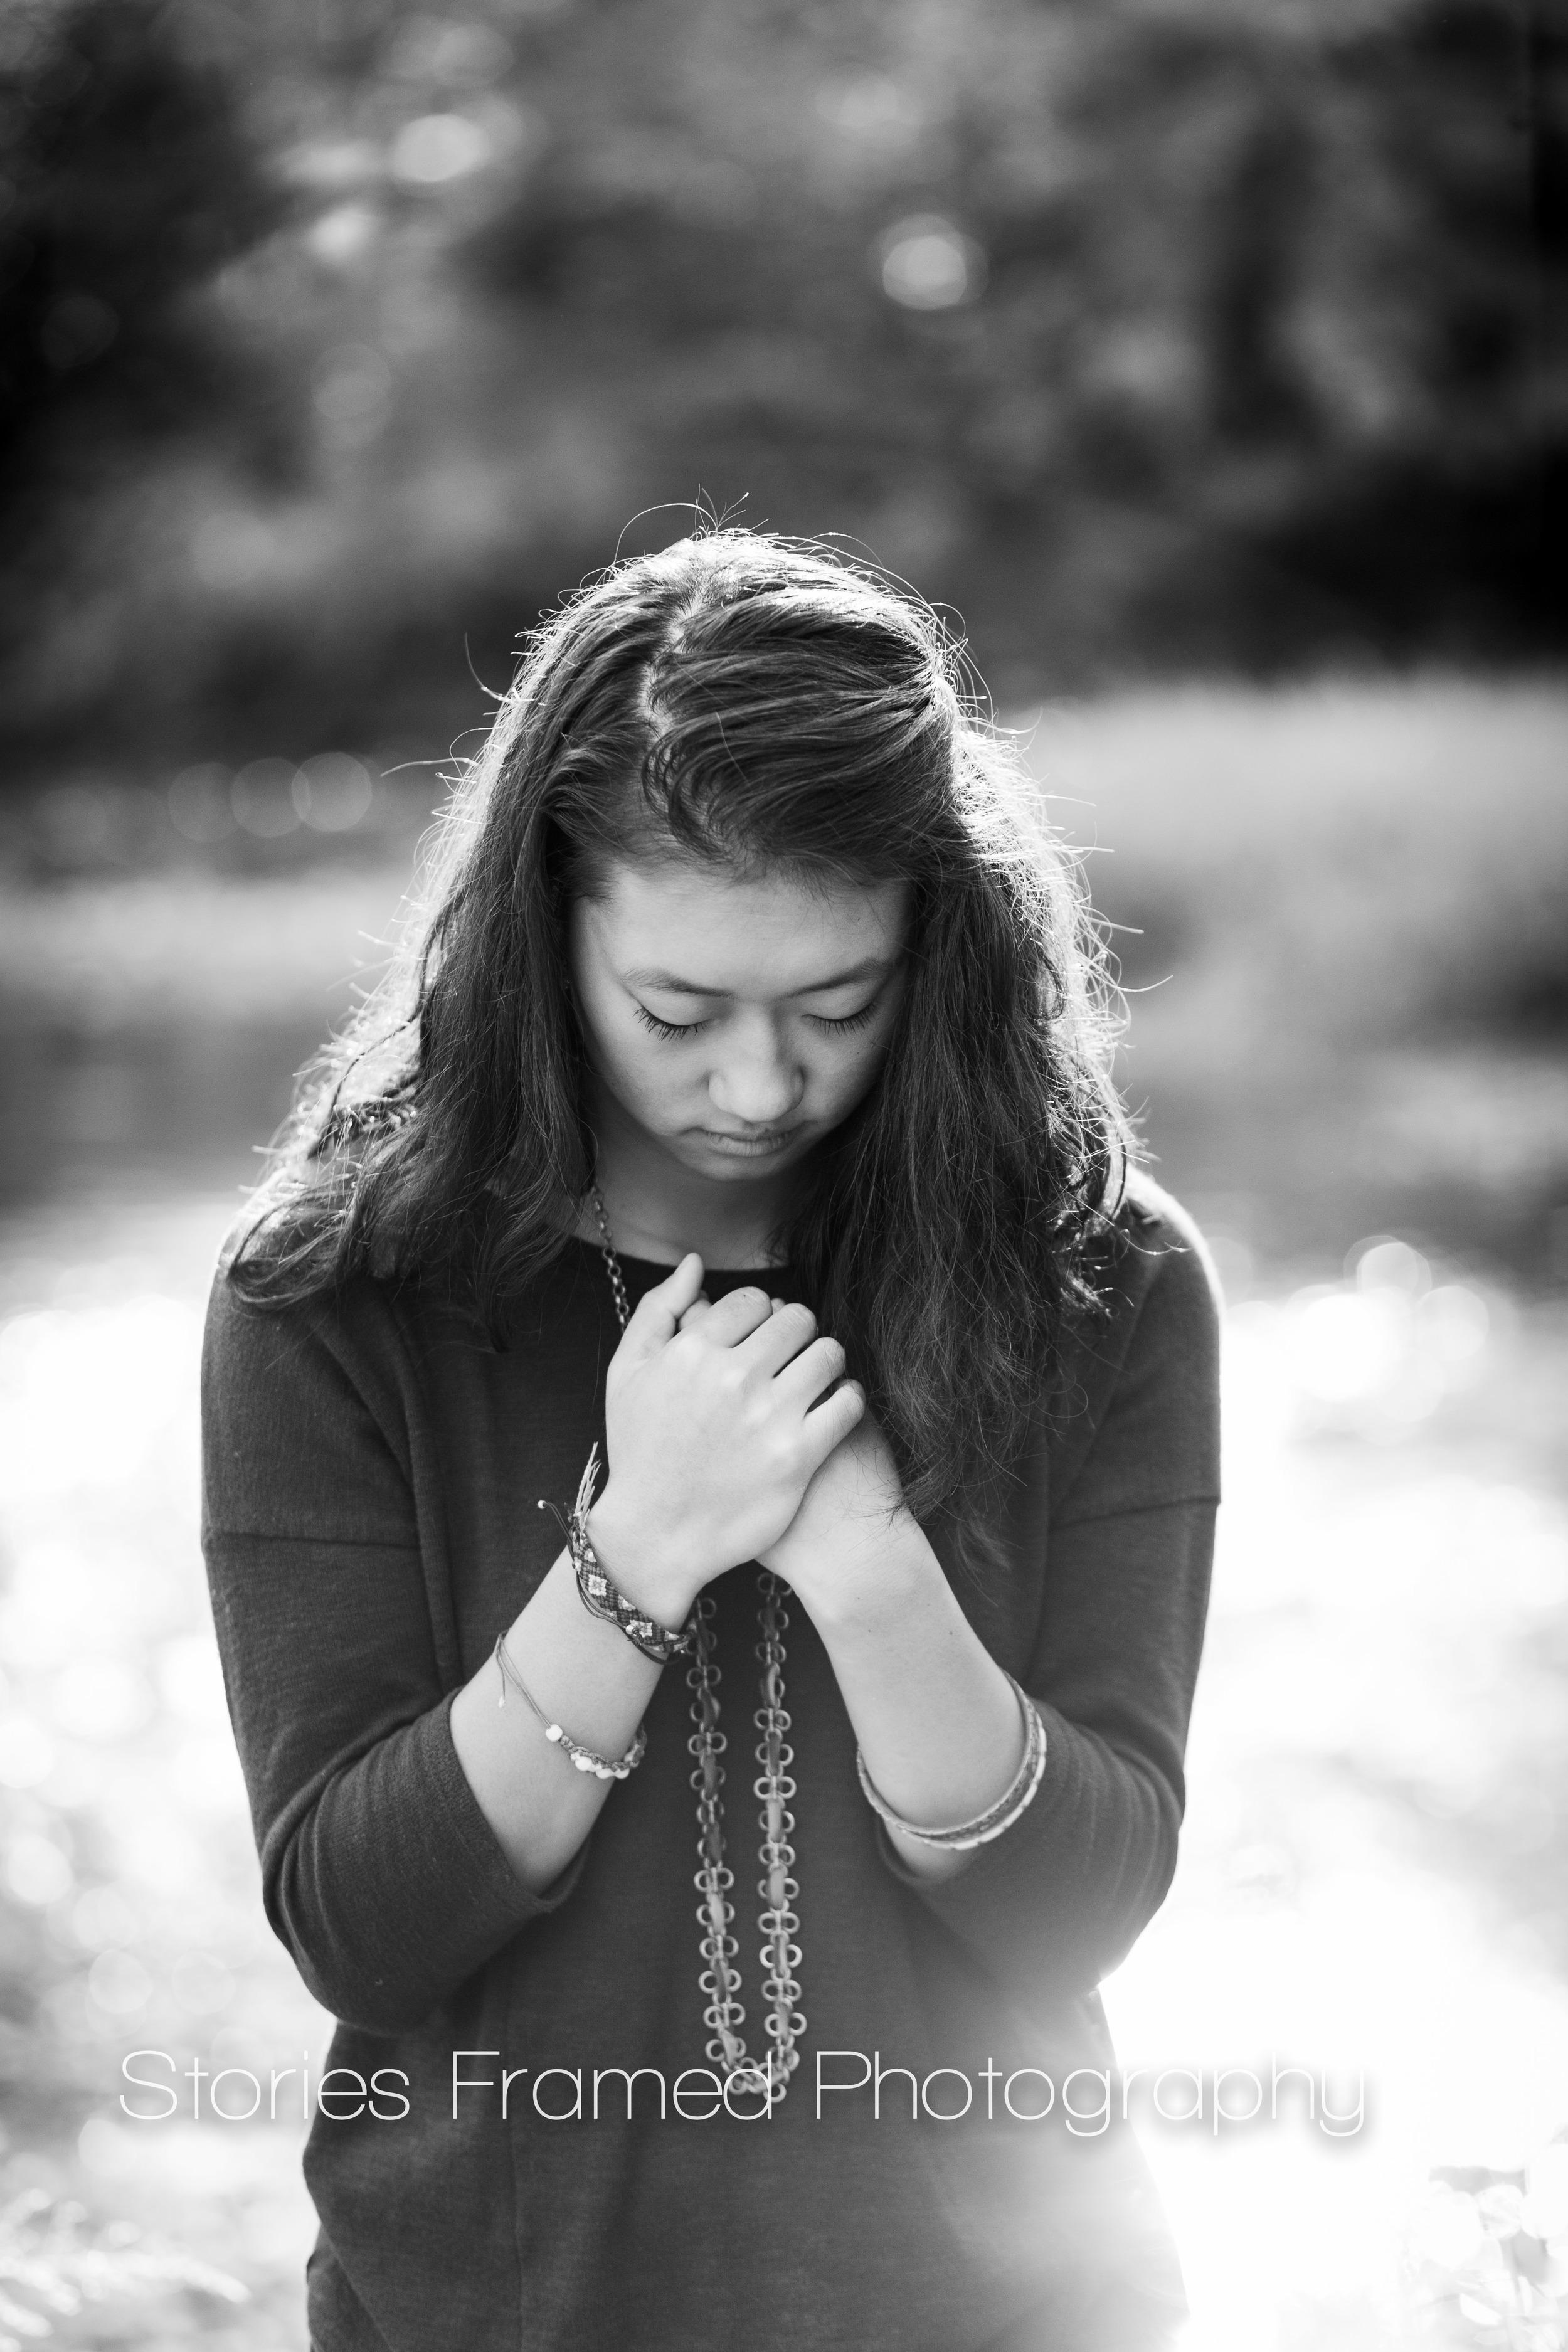 Stories Framed Photography | Senior | Class of 2015 | Elizabeth B&W